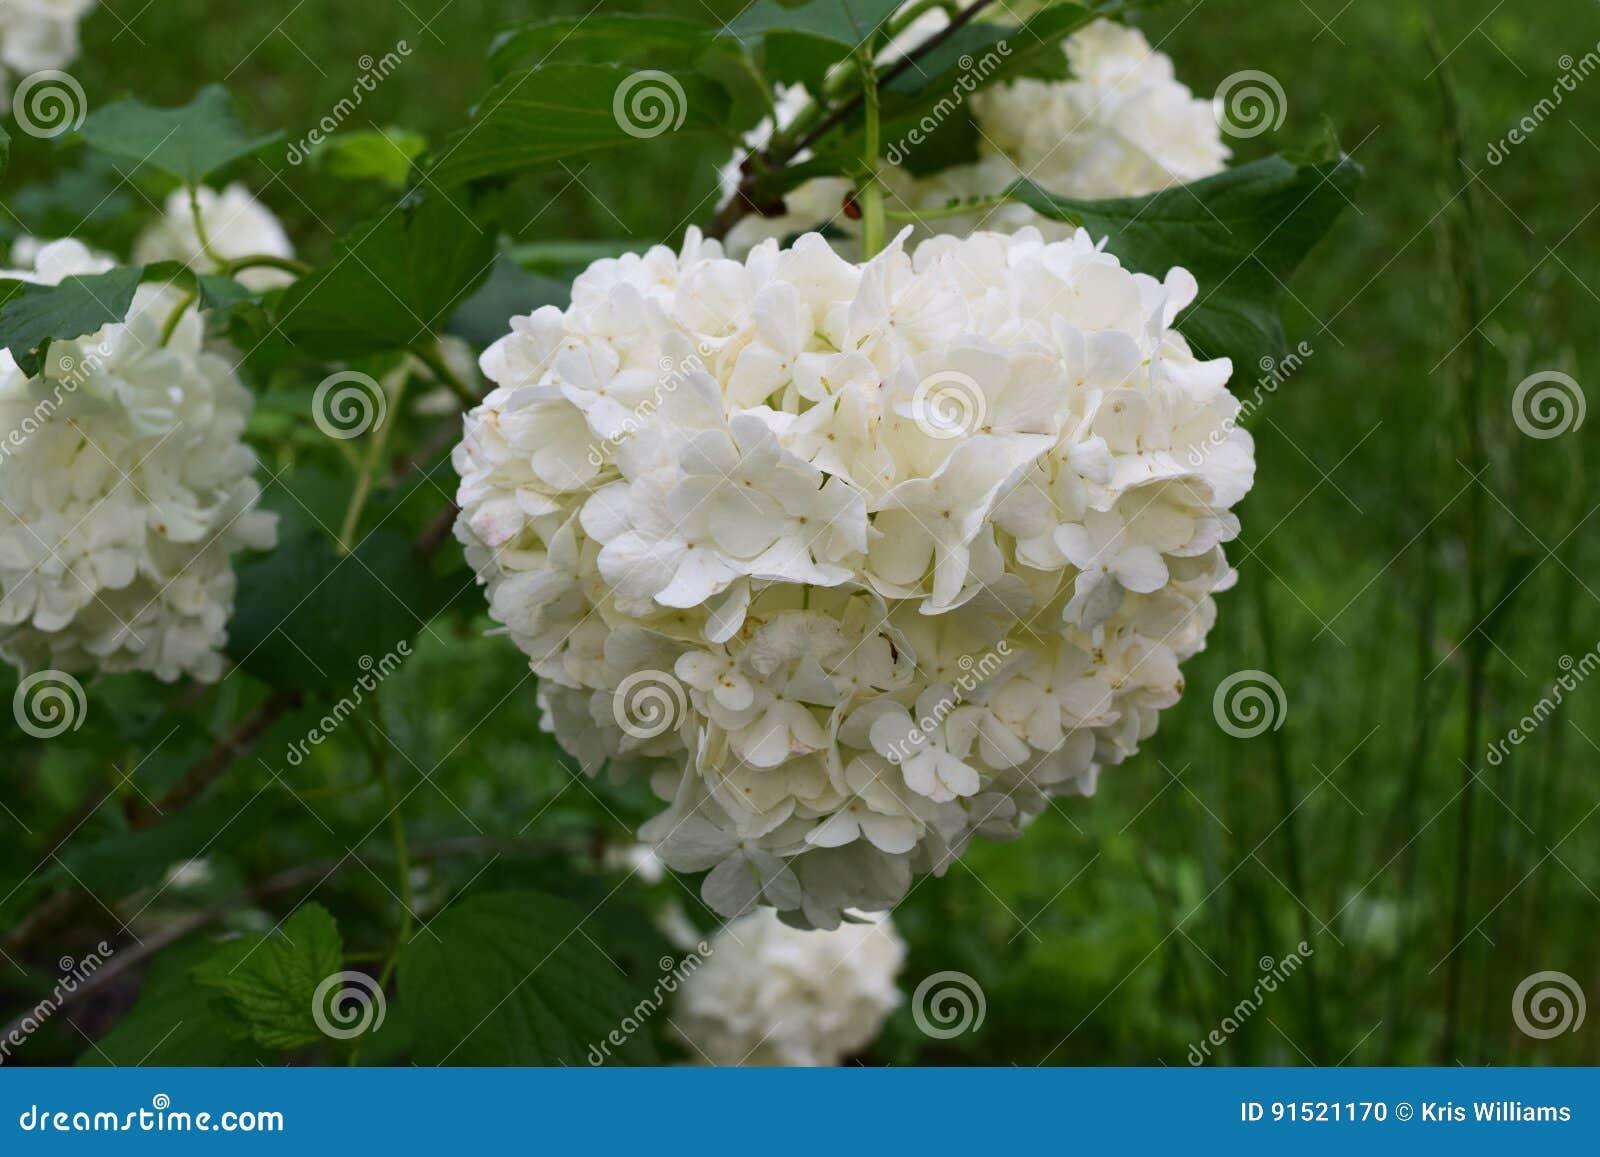 Snowball bush white bloom